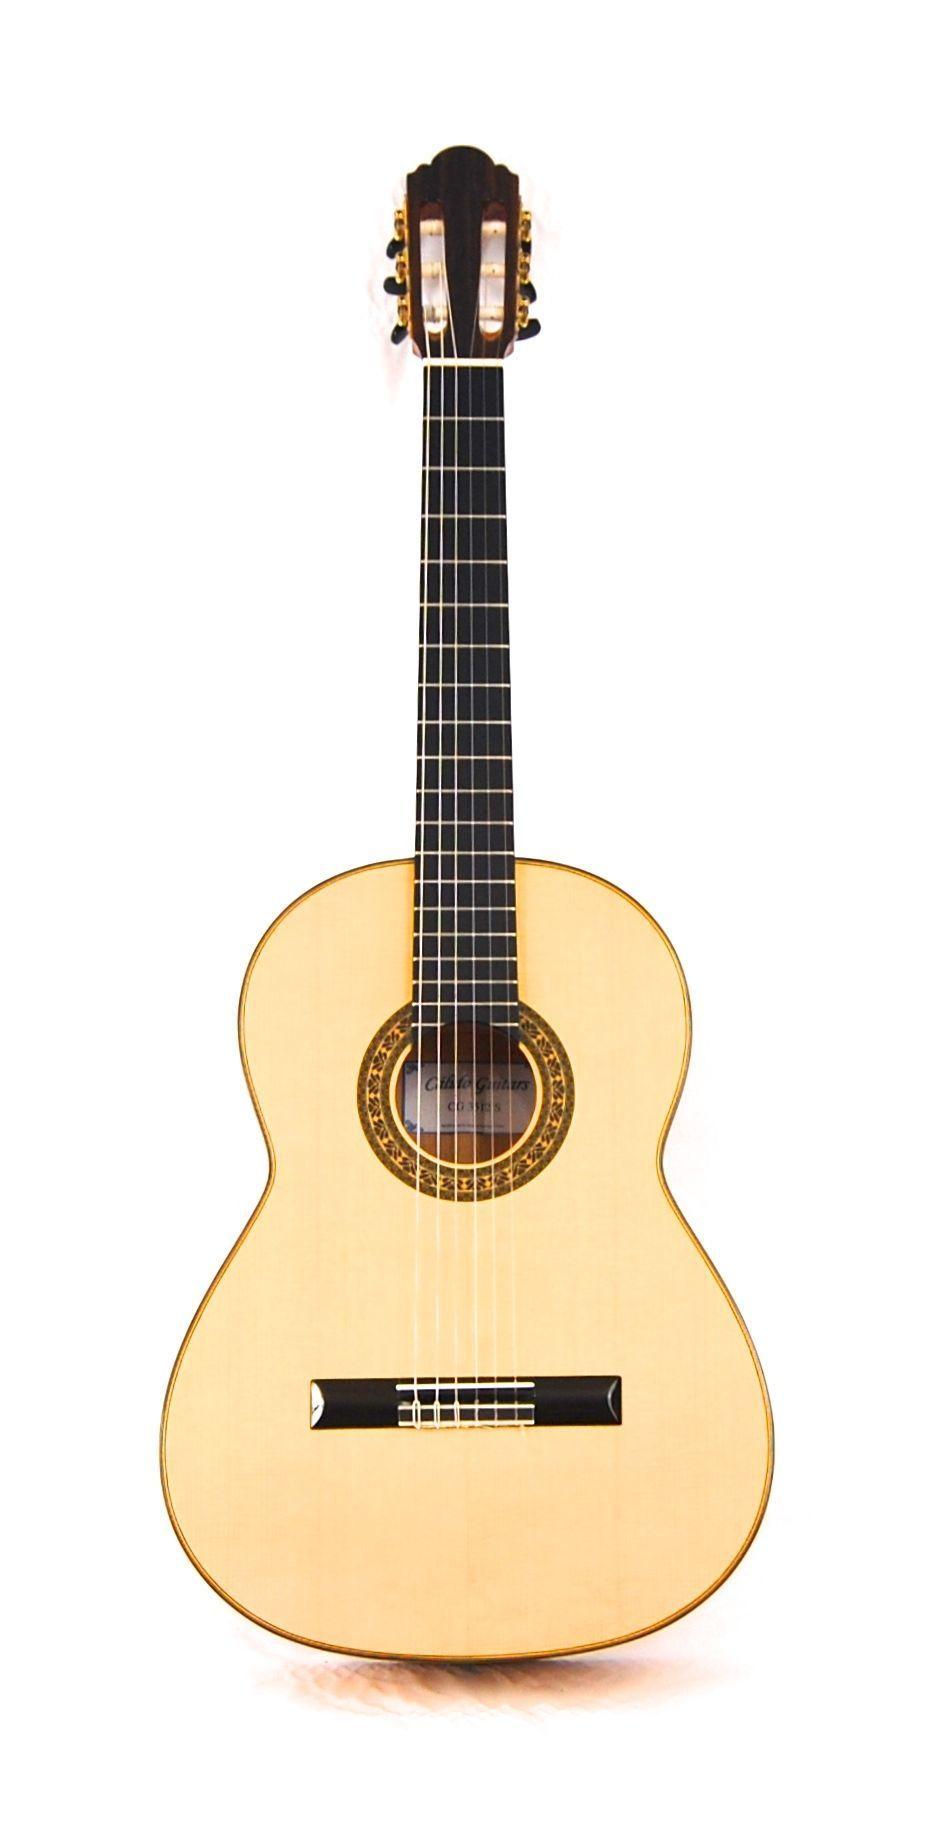 Calido CG 3512-S Advanced Classical Guitar